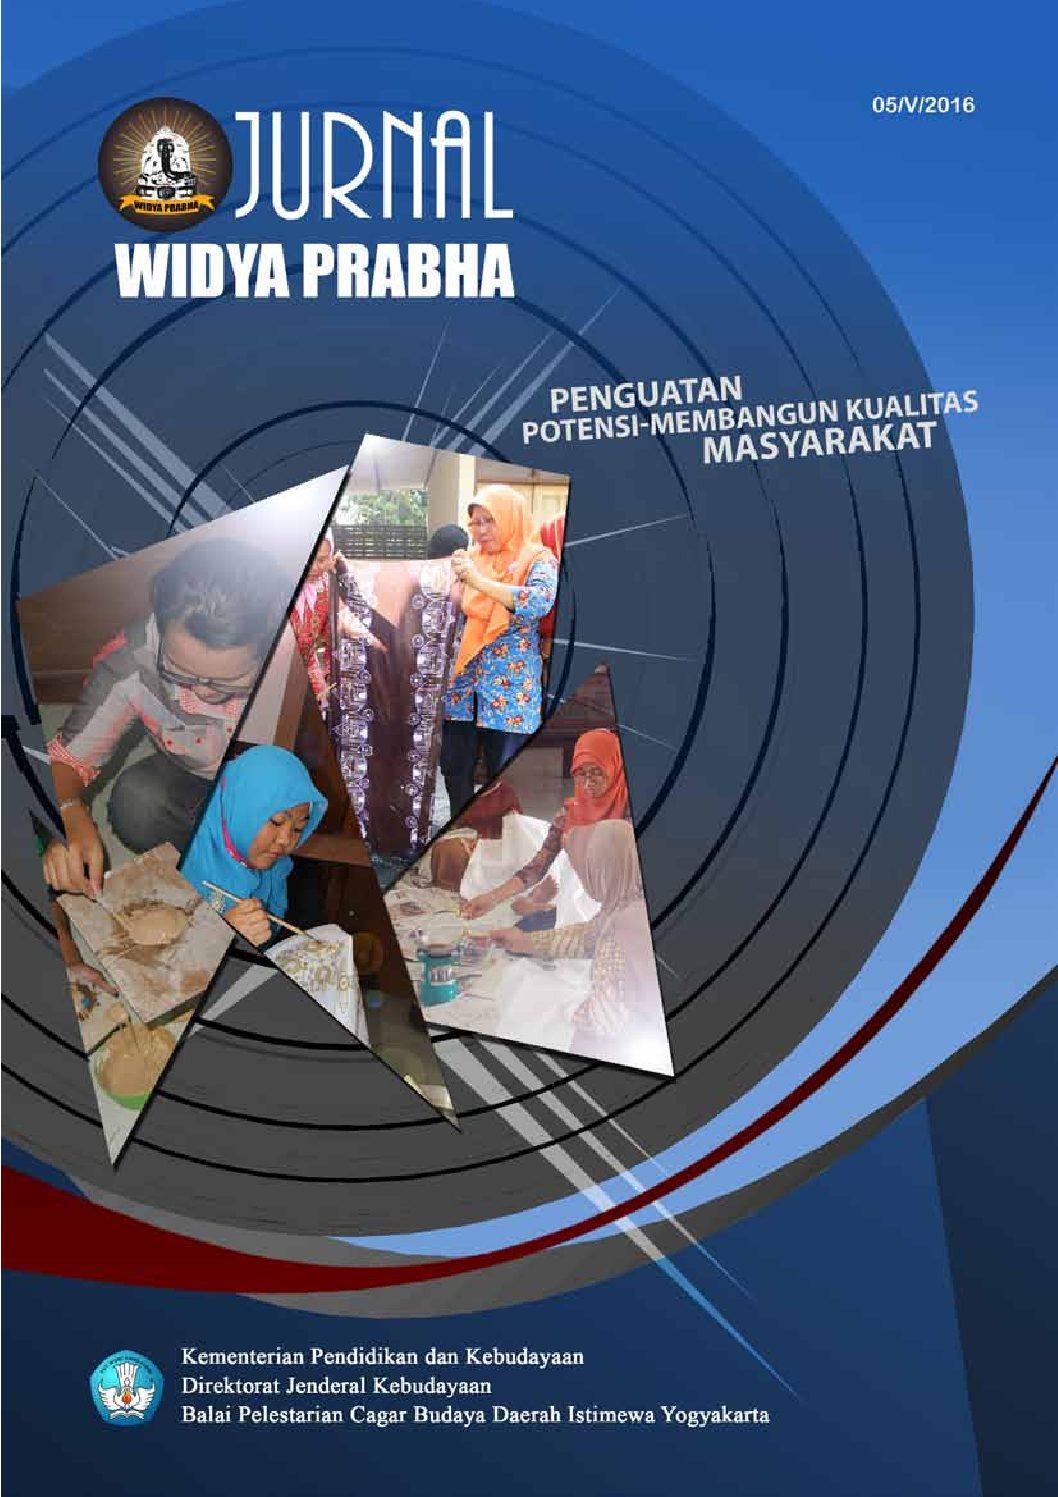 Read more about the article Jurnal Widya Prabha No. 05/V/2016